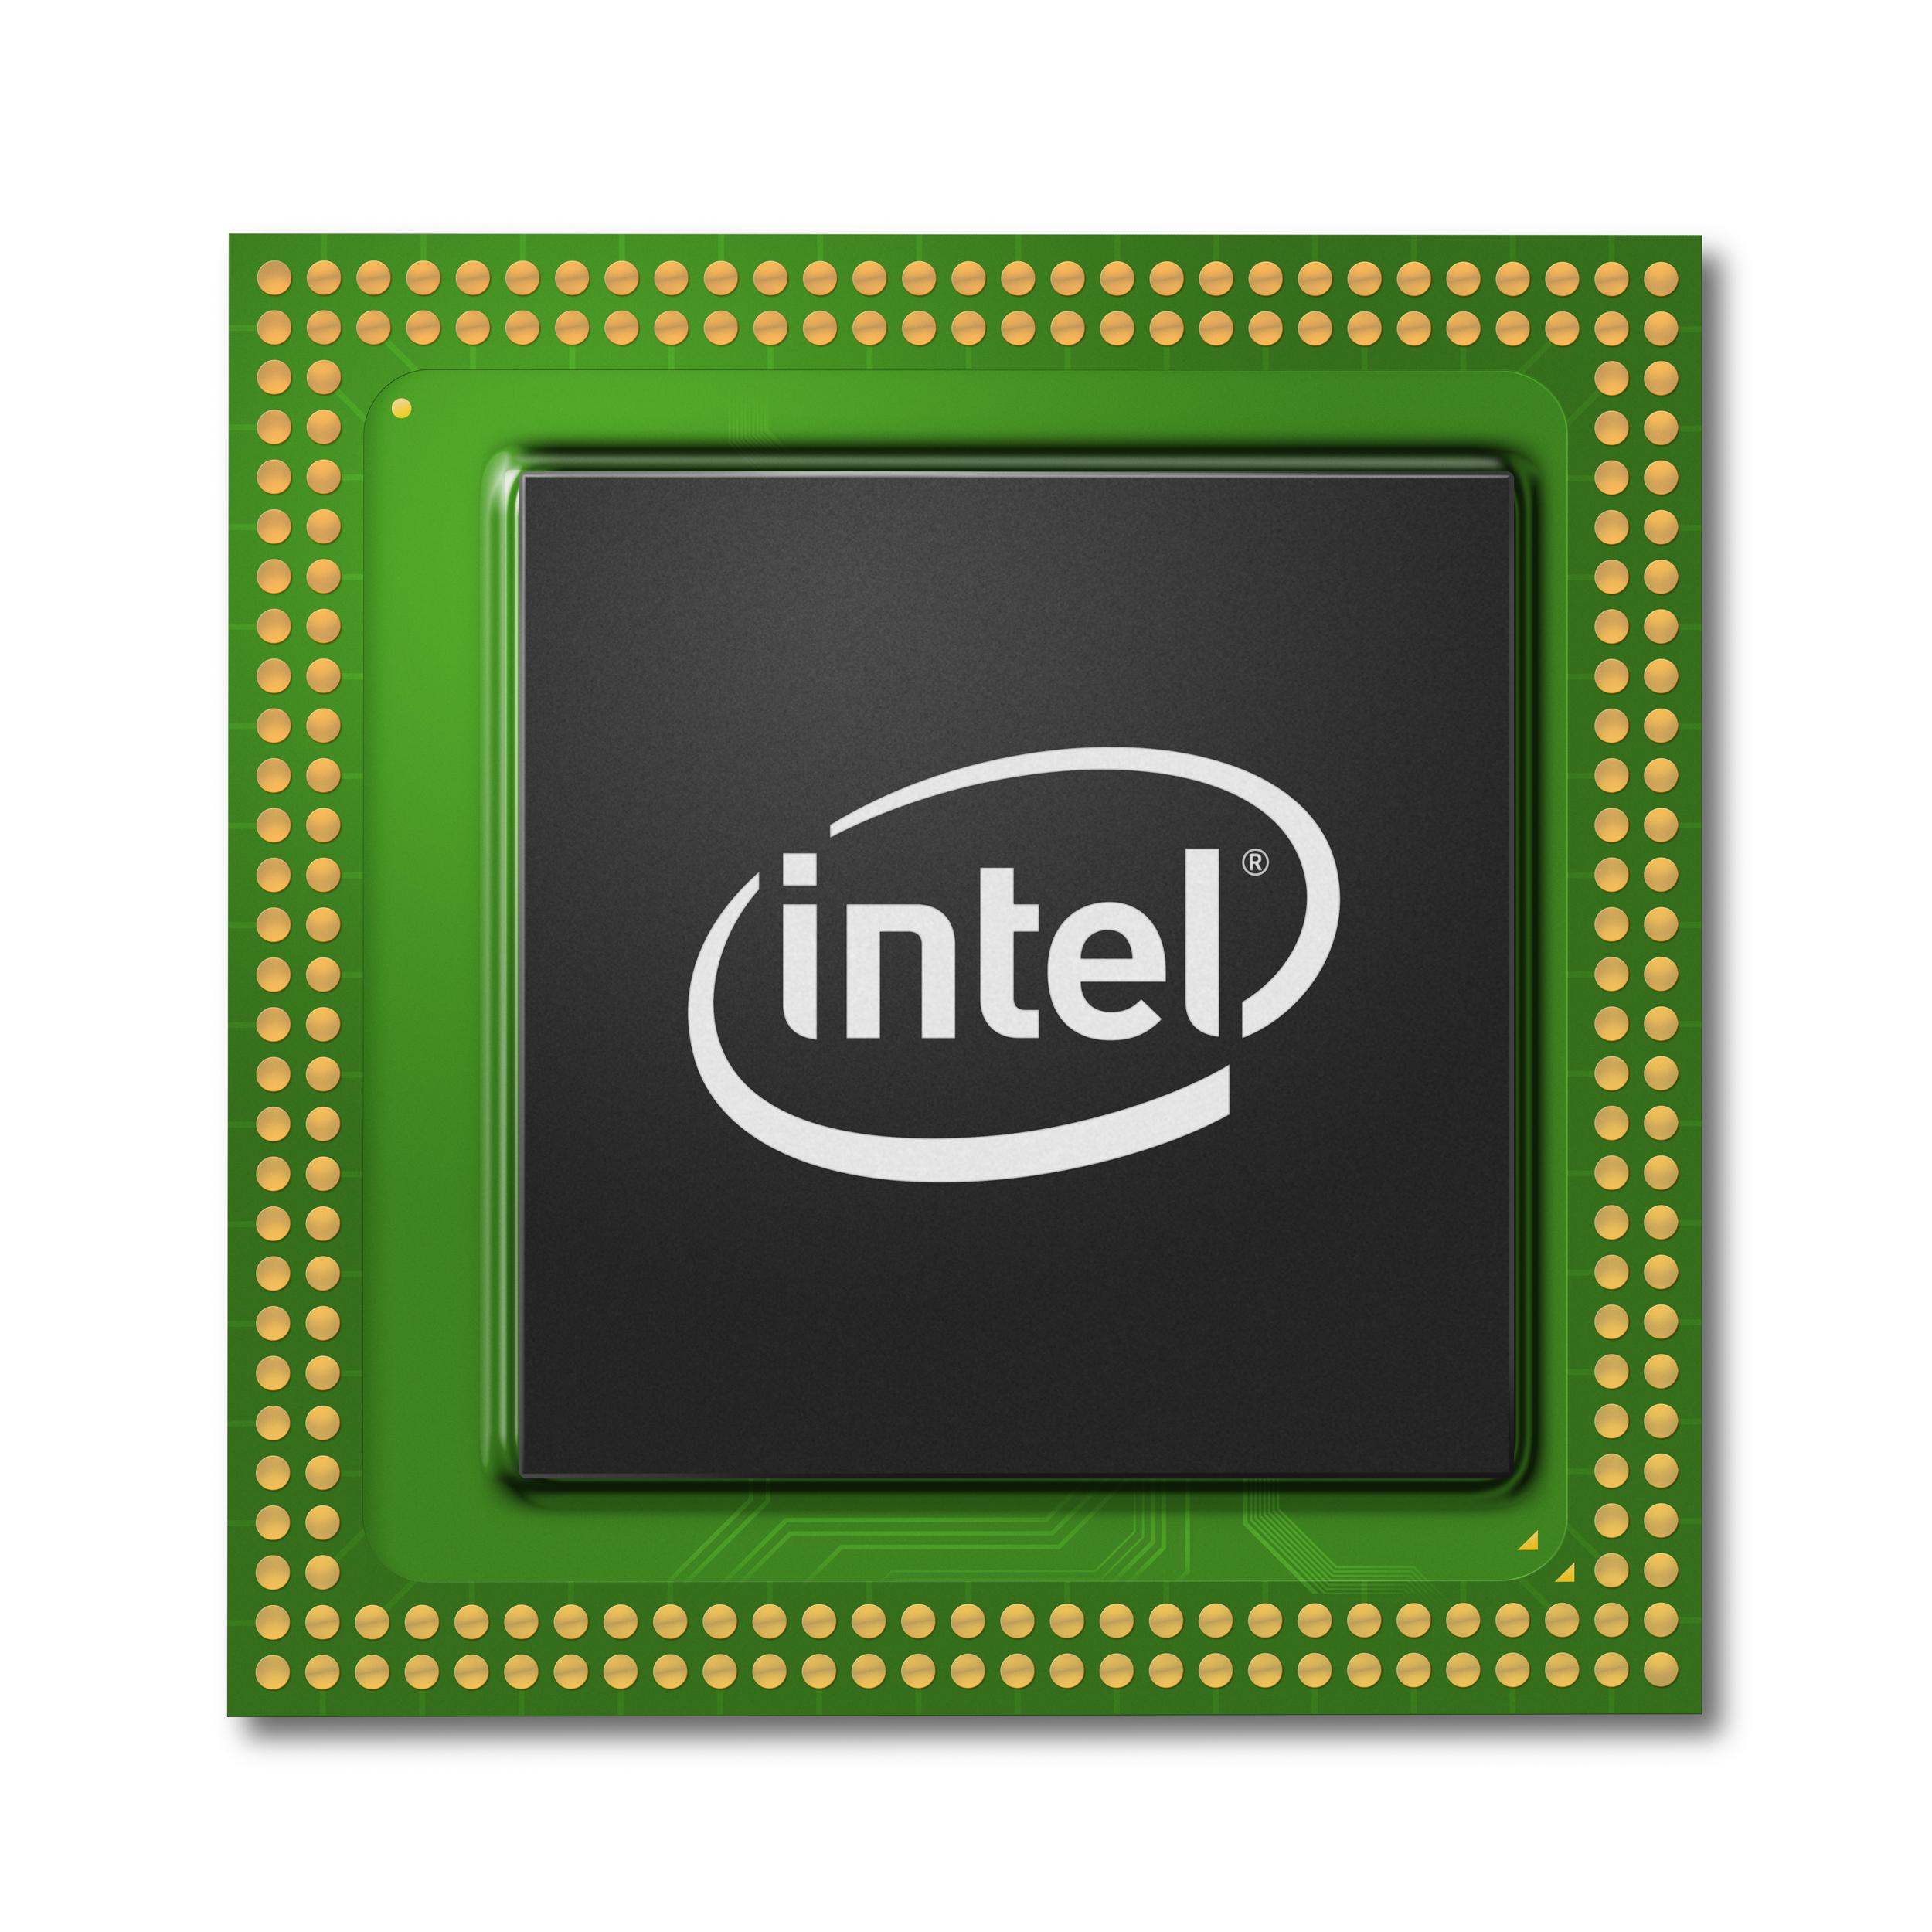 Intel_Atom_Processor_Z2460_Front.jpg